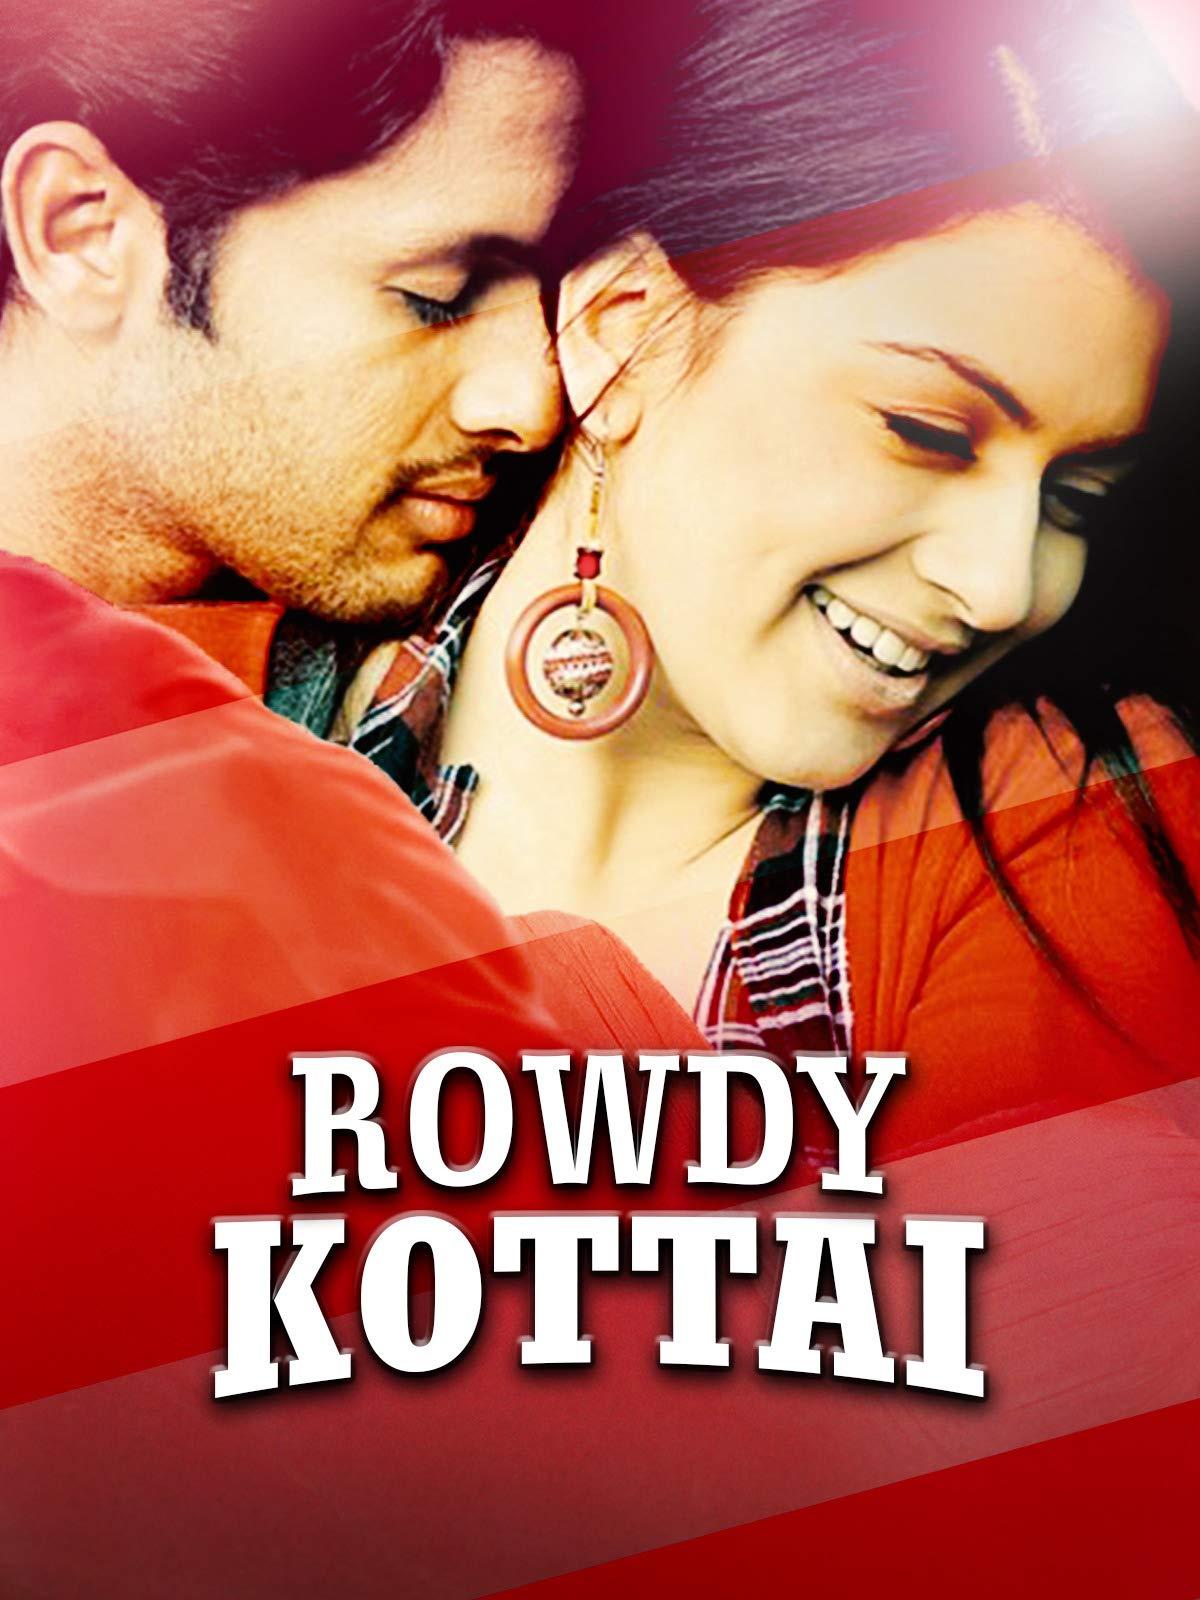 Amazon co uk: Watch Rowdy Kottai   Prime Video